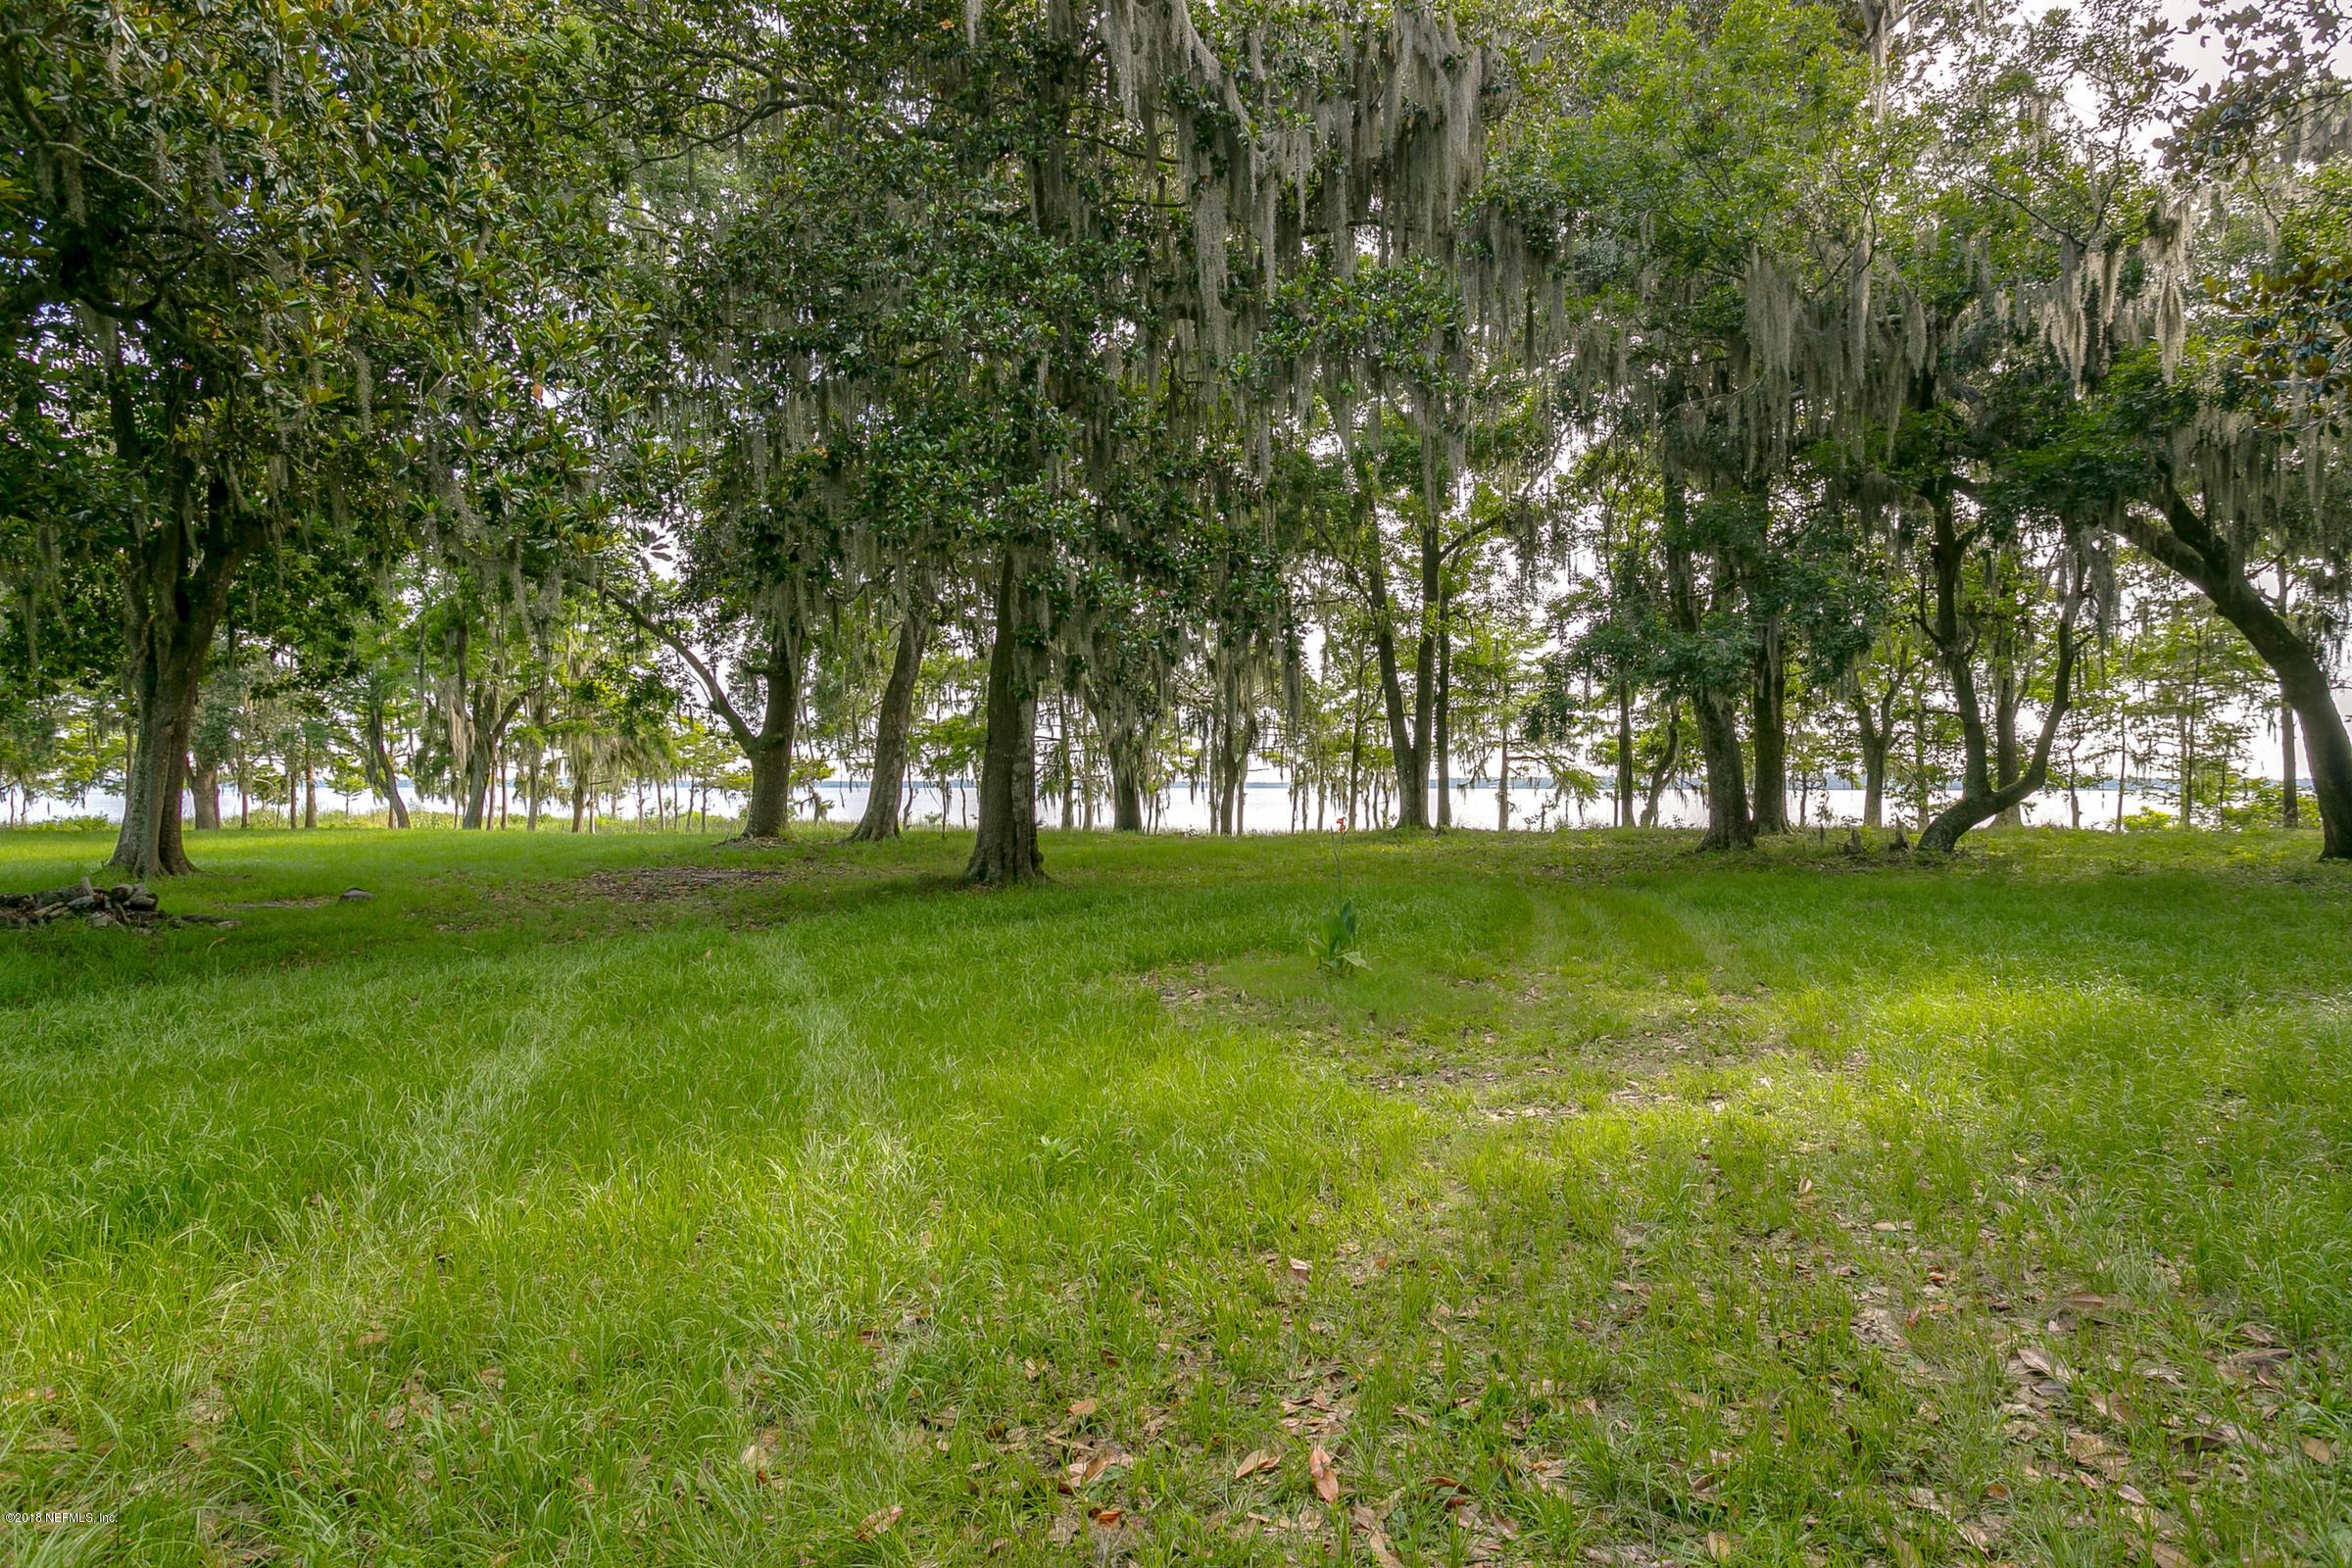 194 BAYARD, GREEN COVE SPRINGS, FLORIDA 32043, ,Vacant land,For sale,BAYARD,940846